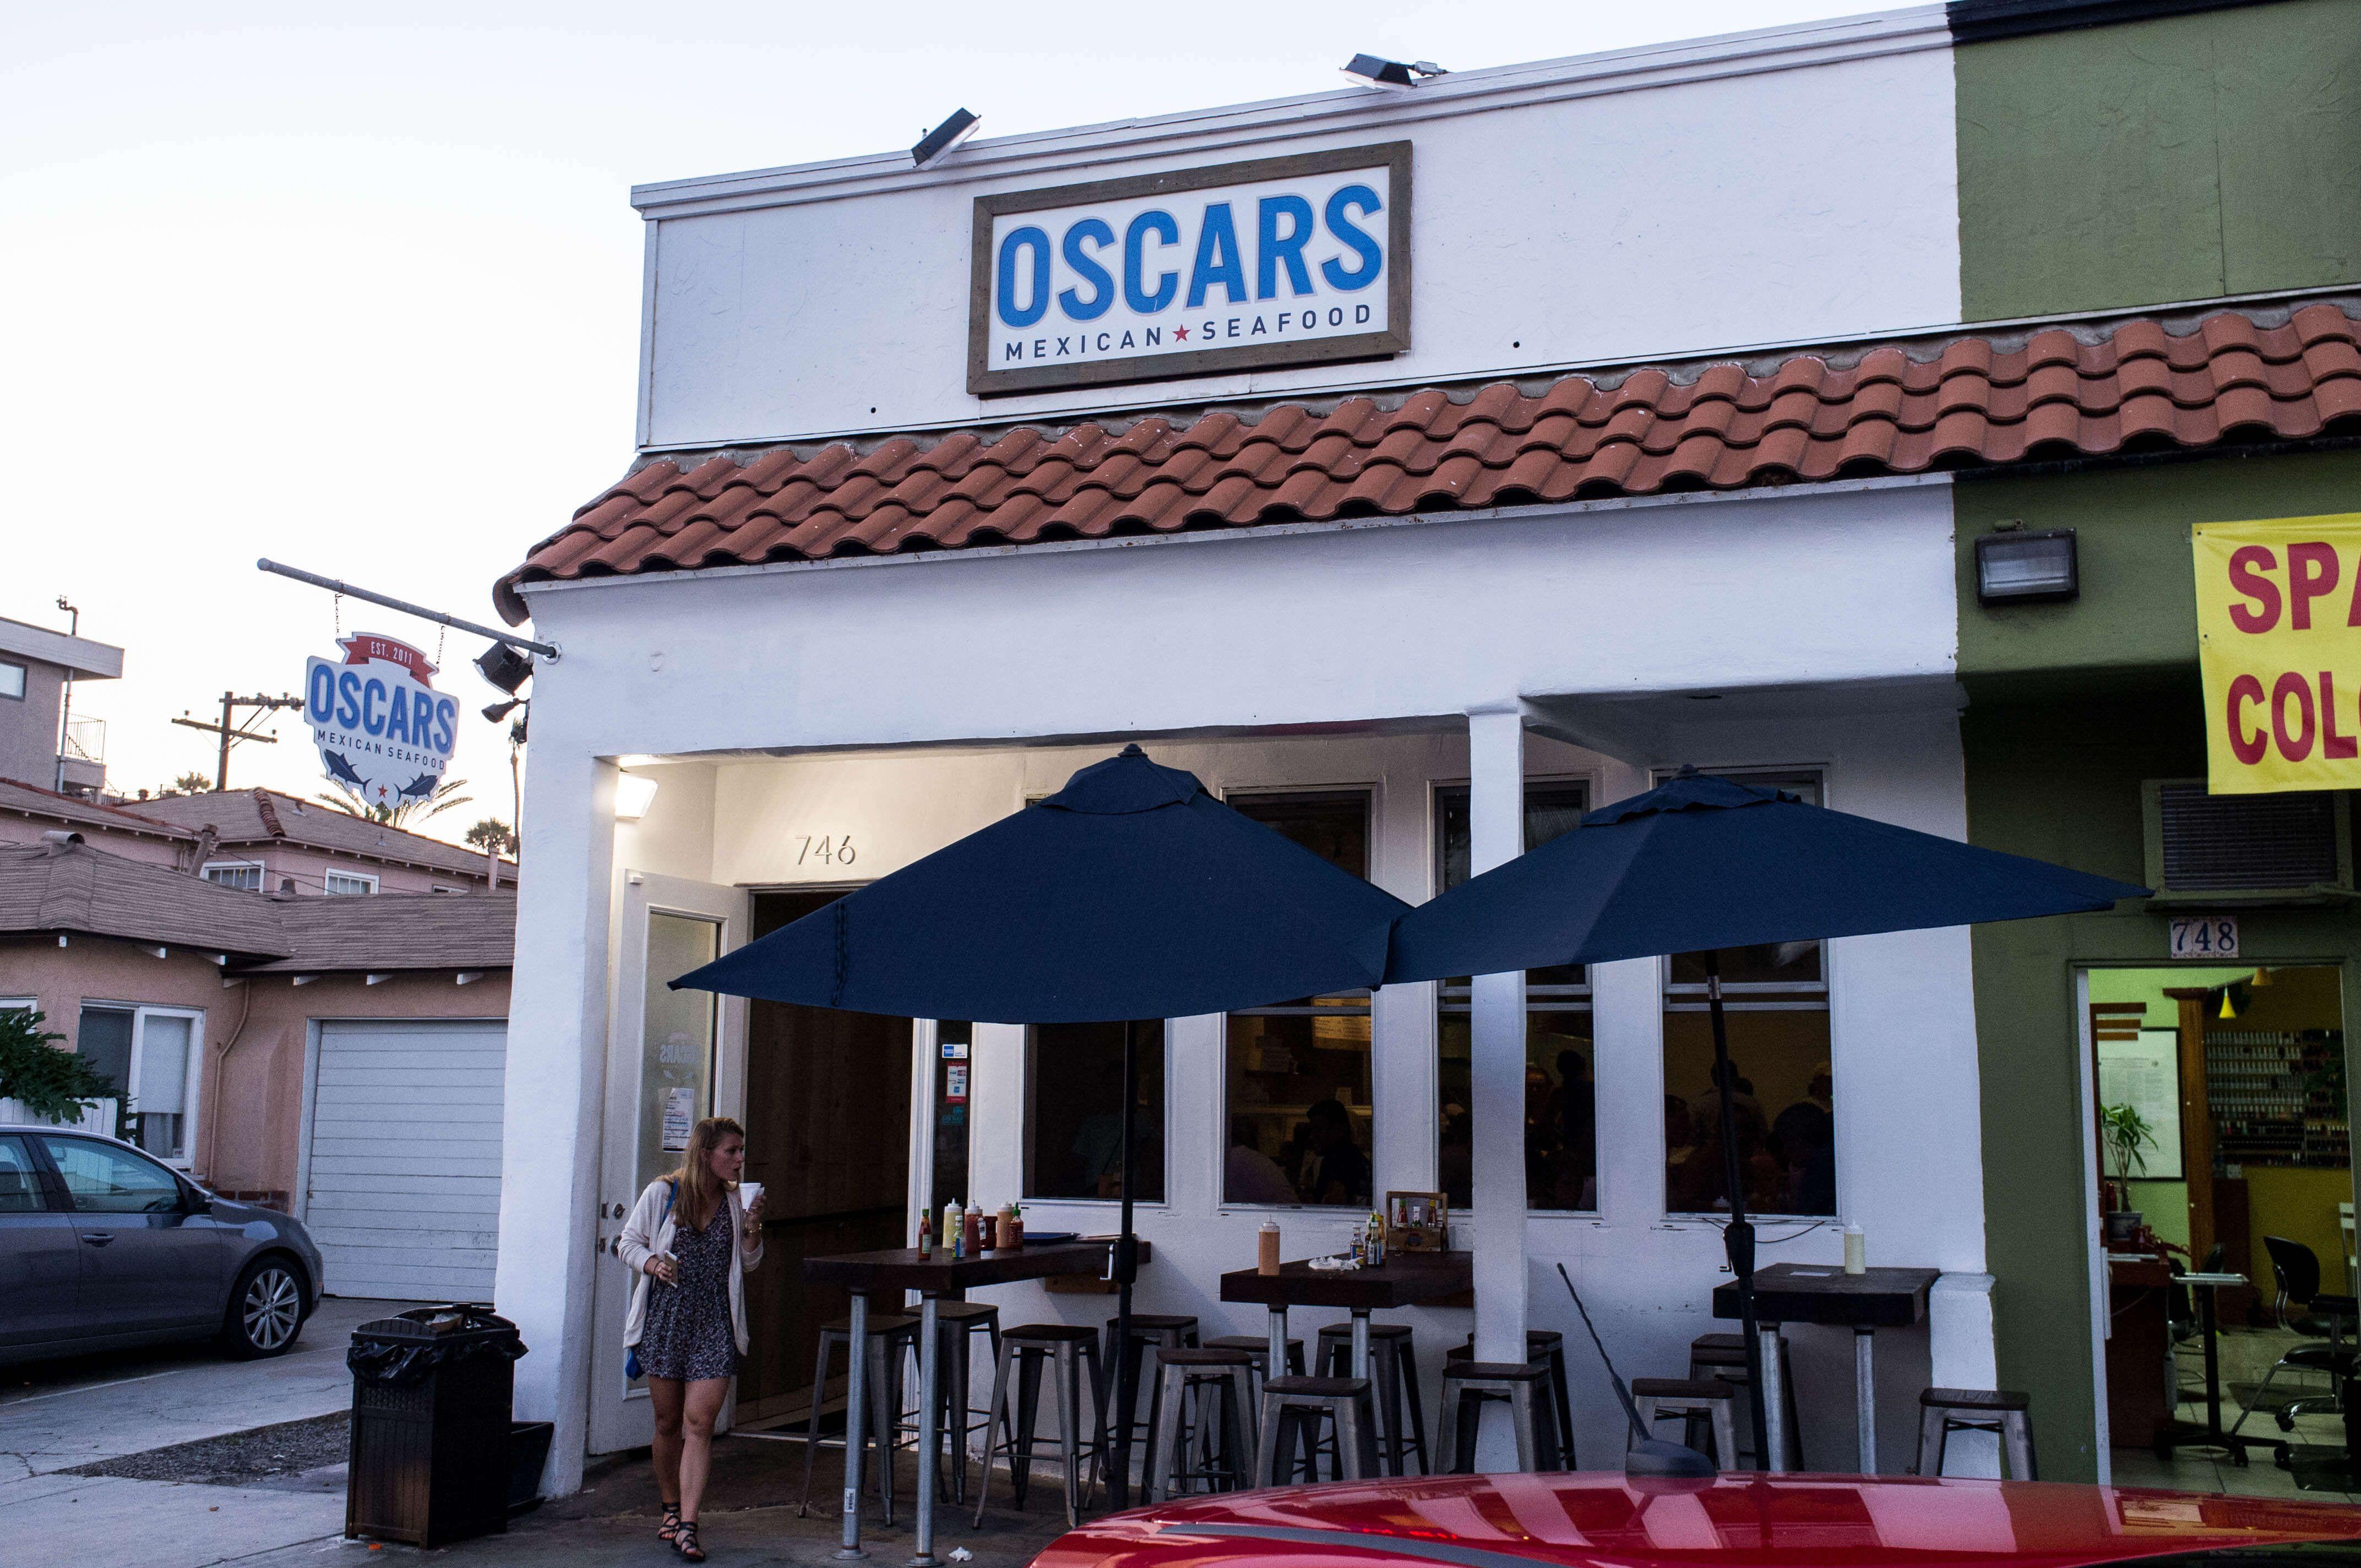 San Diego's Best 30 Taco Shops 2020 in 2020 | San diego ...